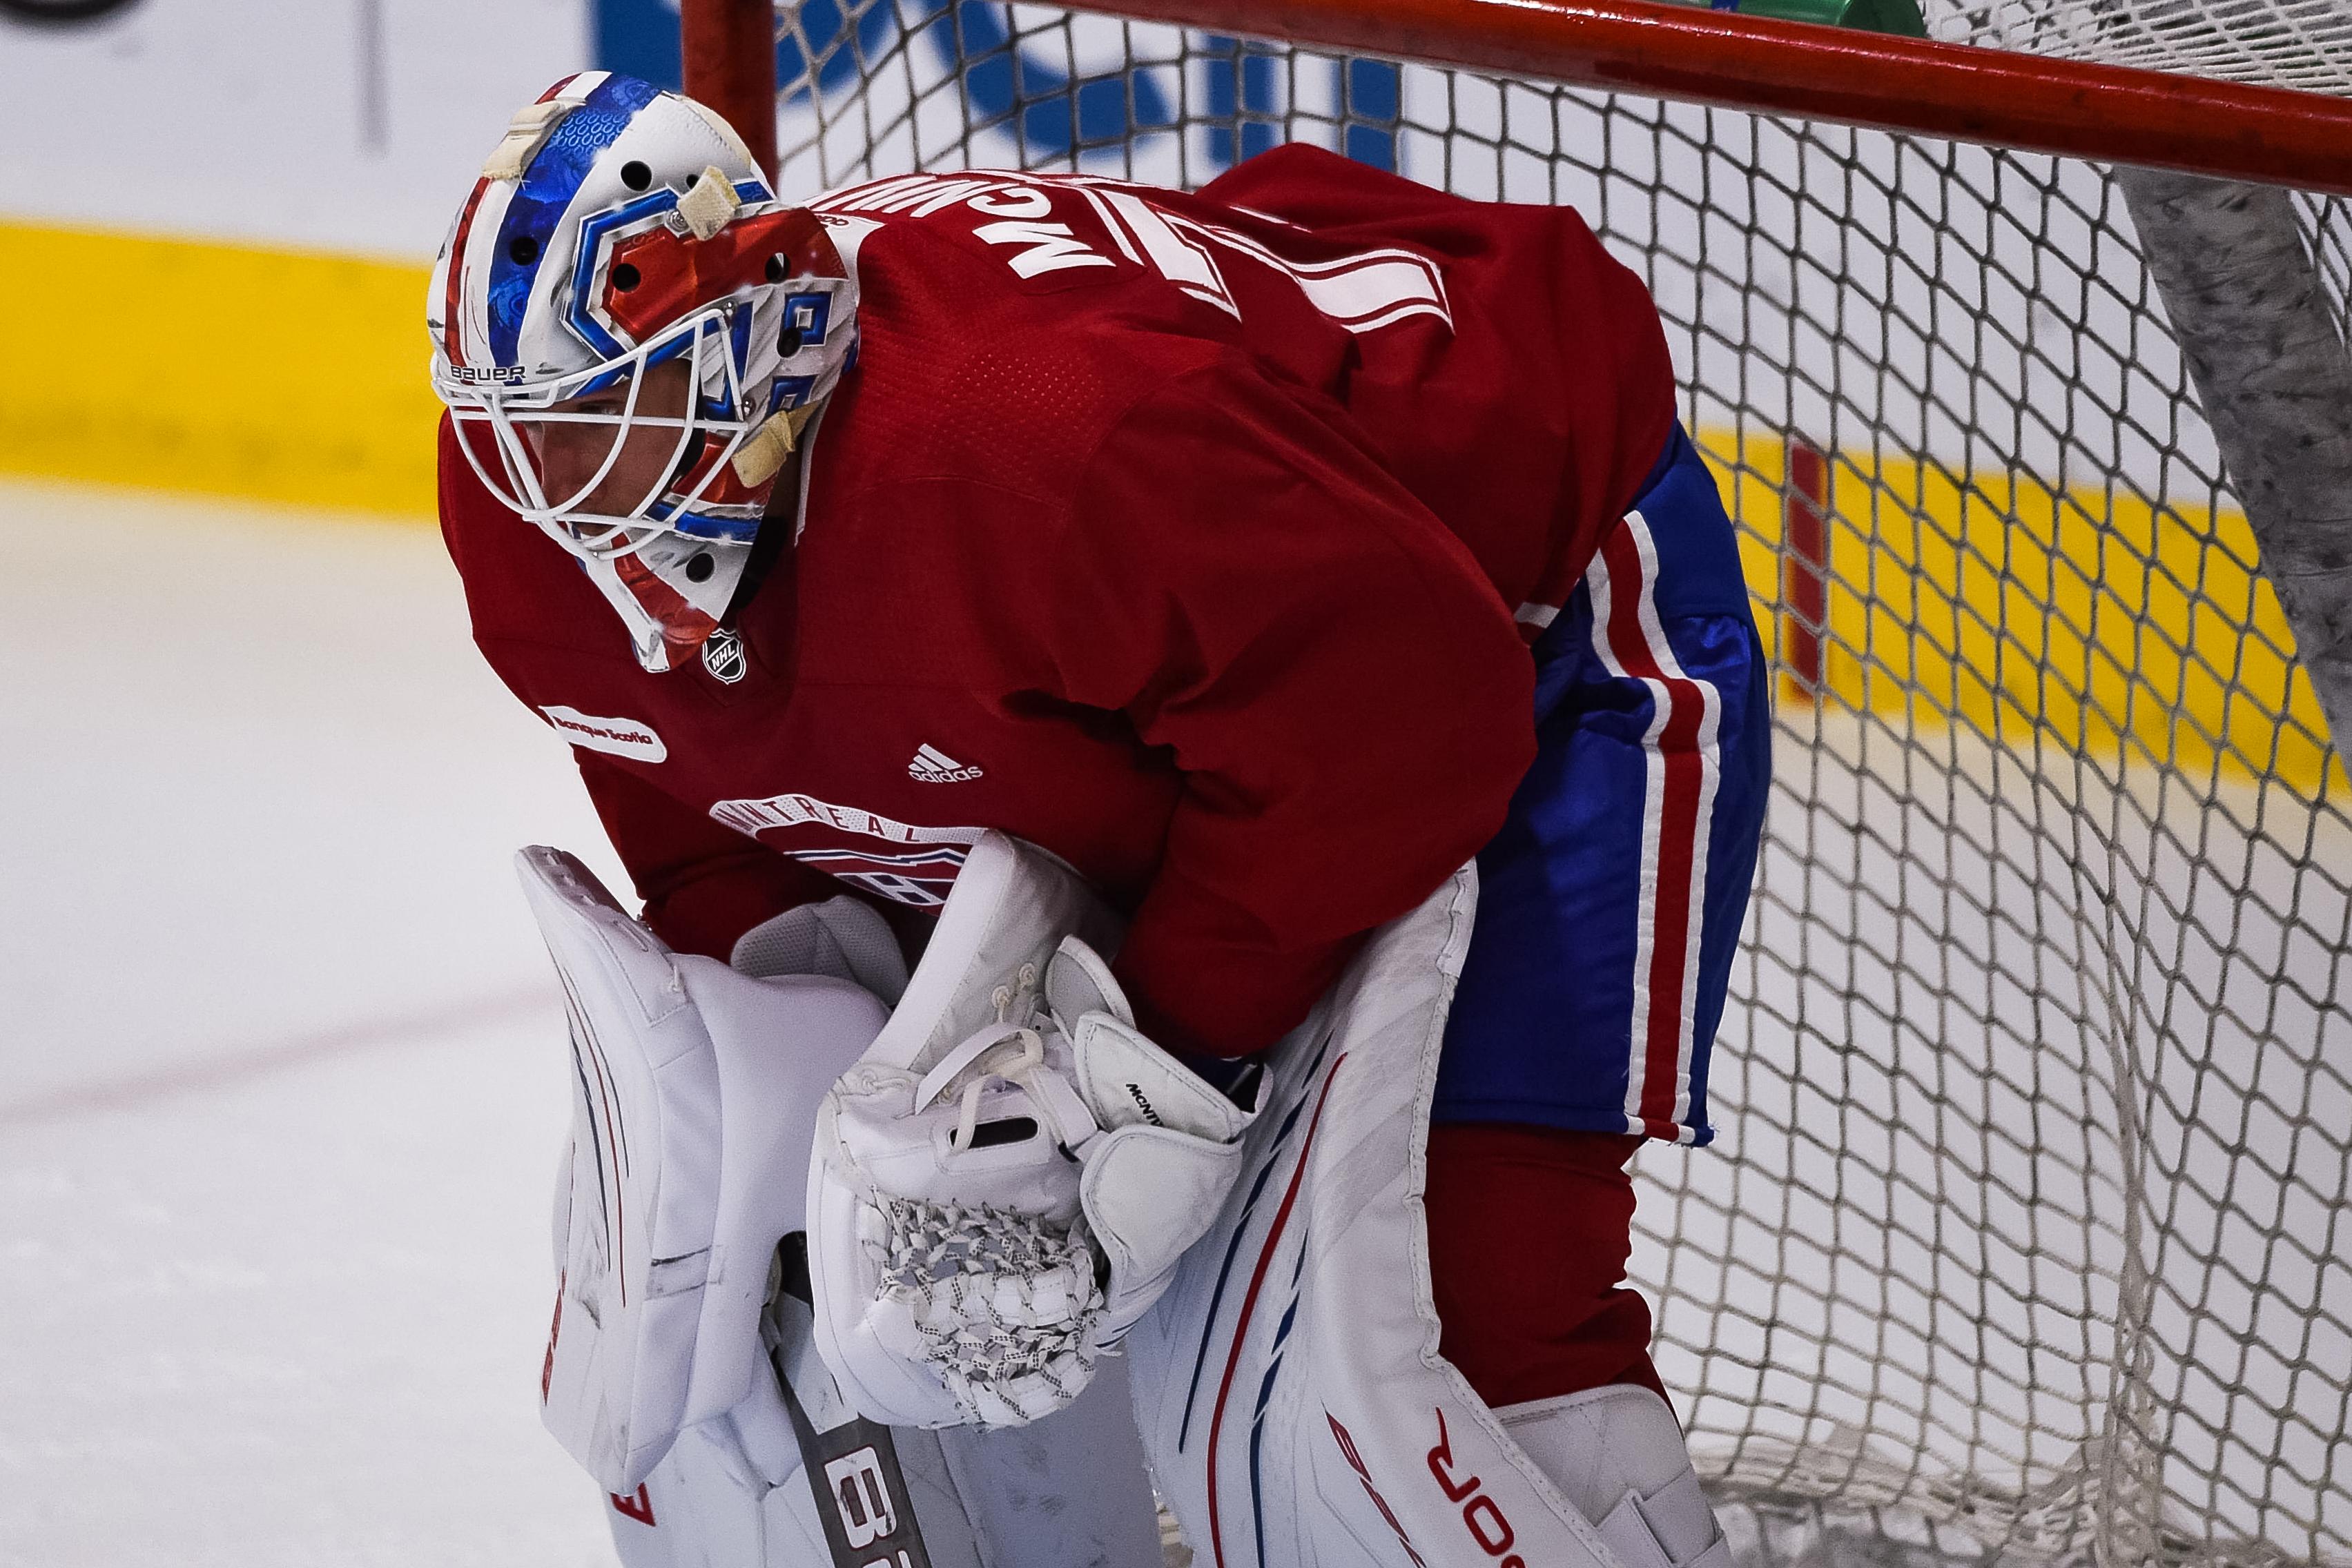 NHL: SEP 23 Canadiens Training Camp